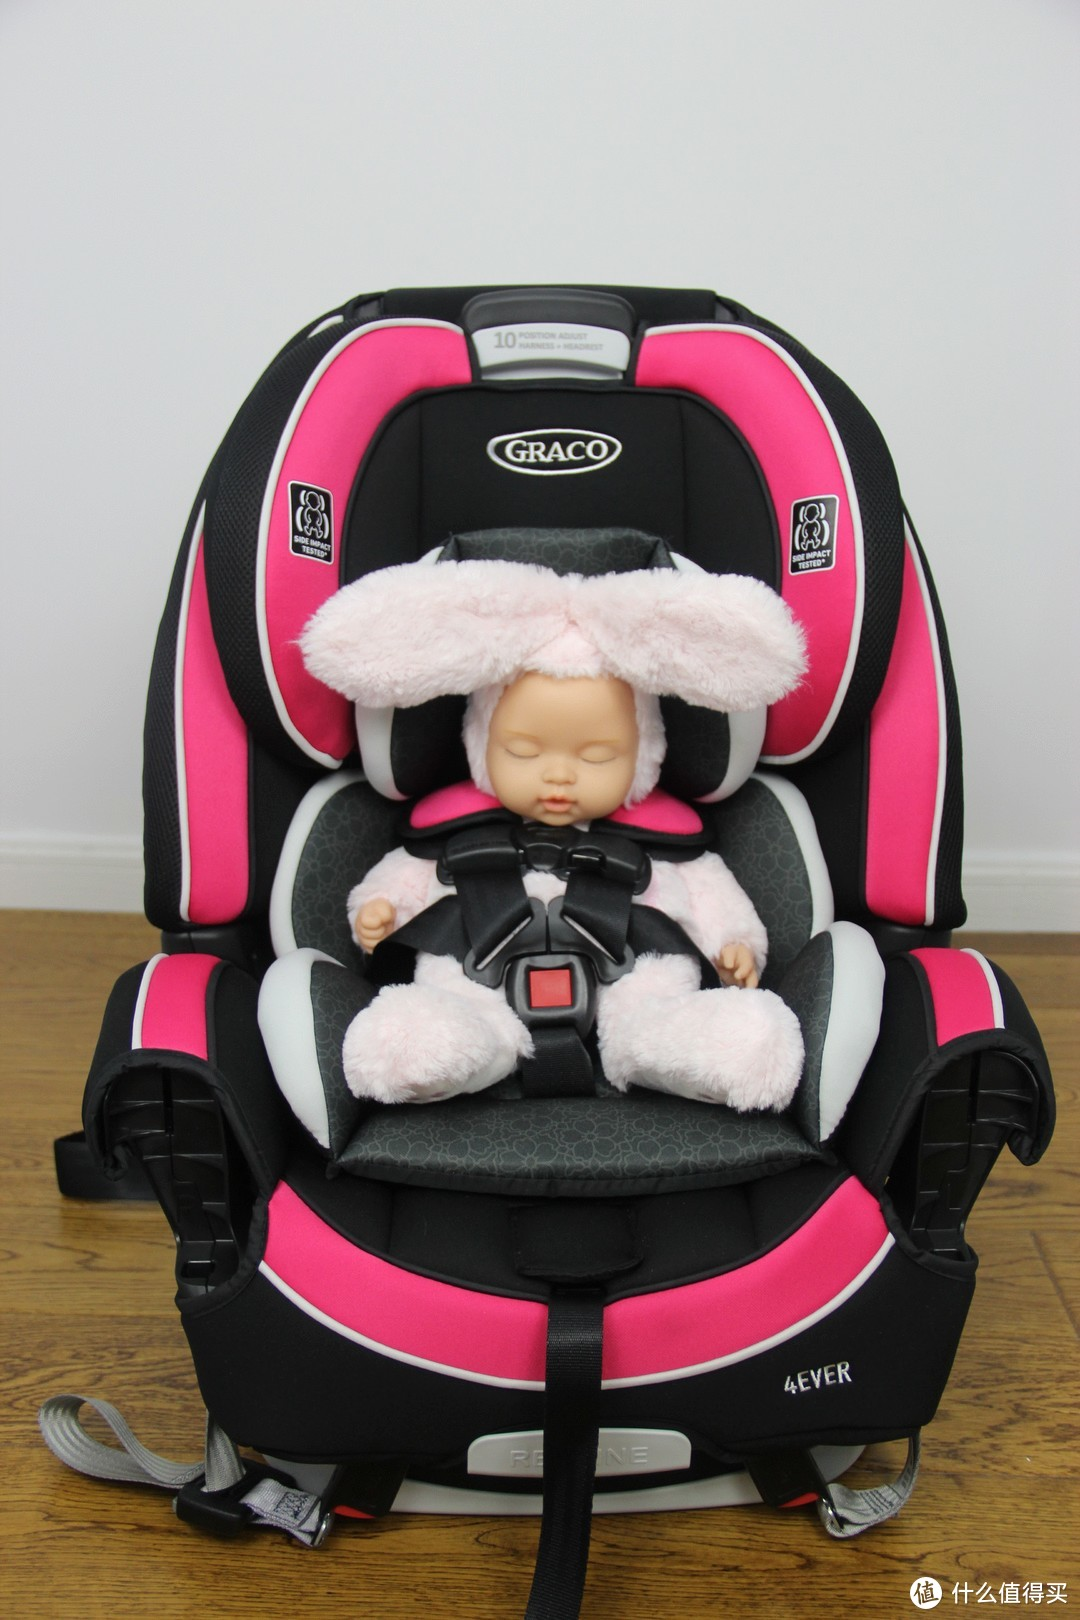 2K价位的儿童座椅参考—Britax头等舱白金版安全座椅开箱评测 对比Graco 4ever